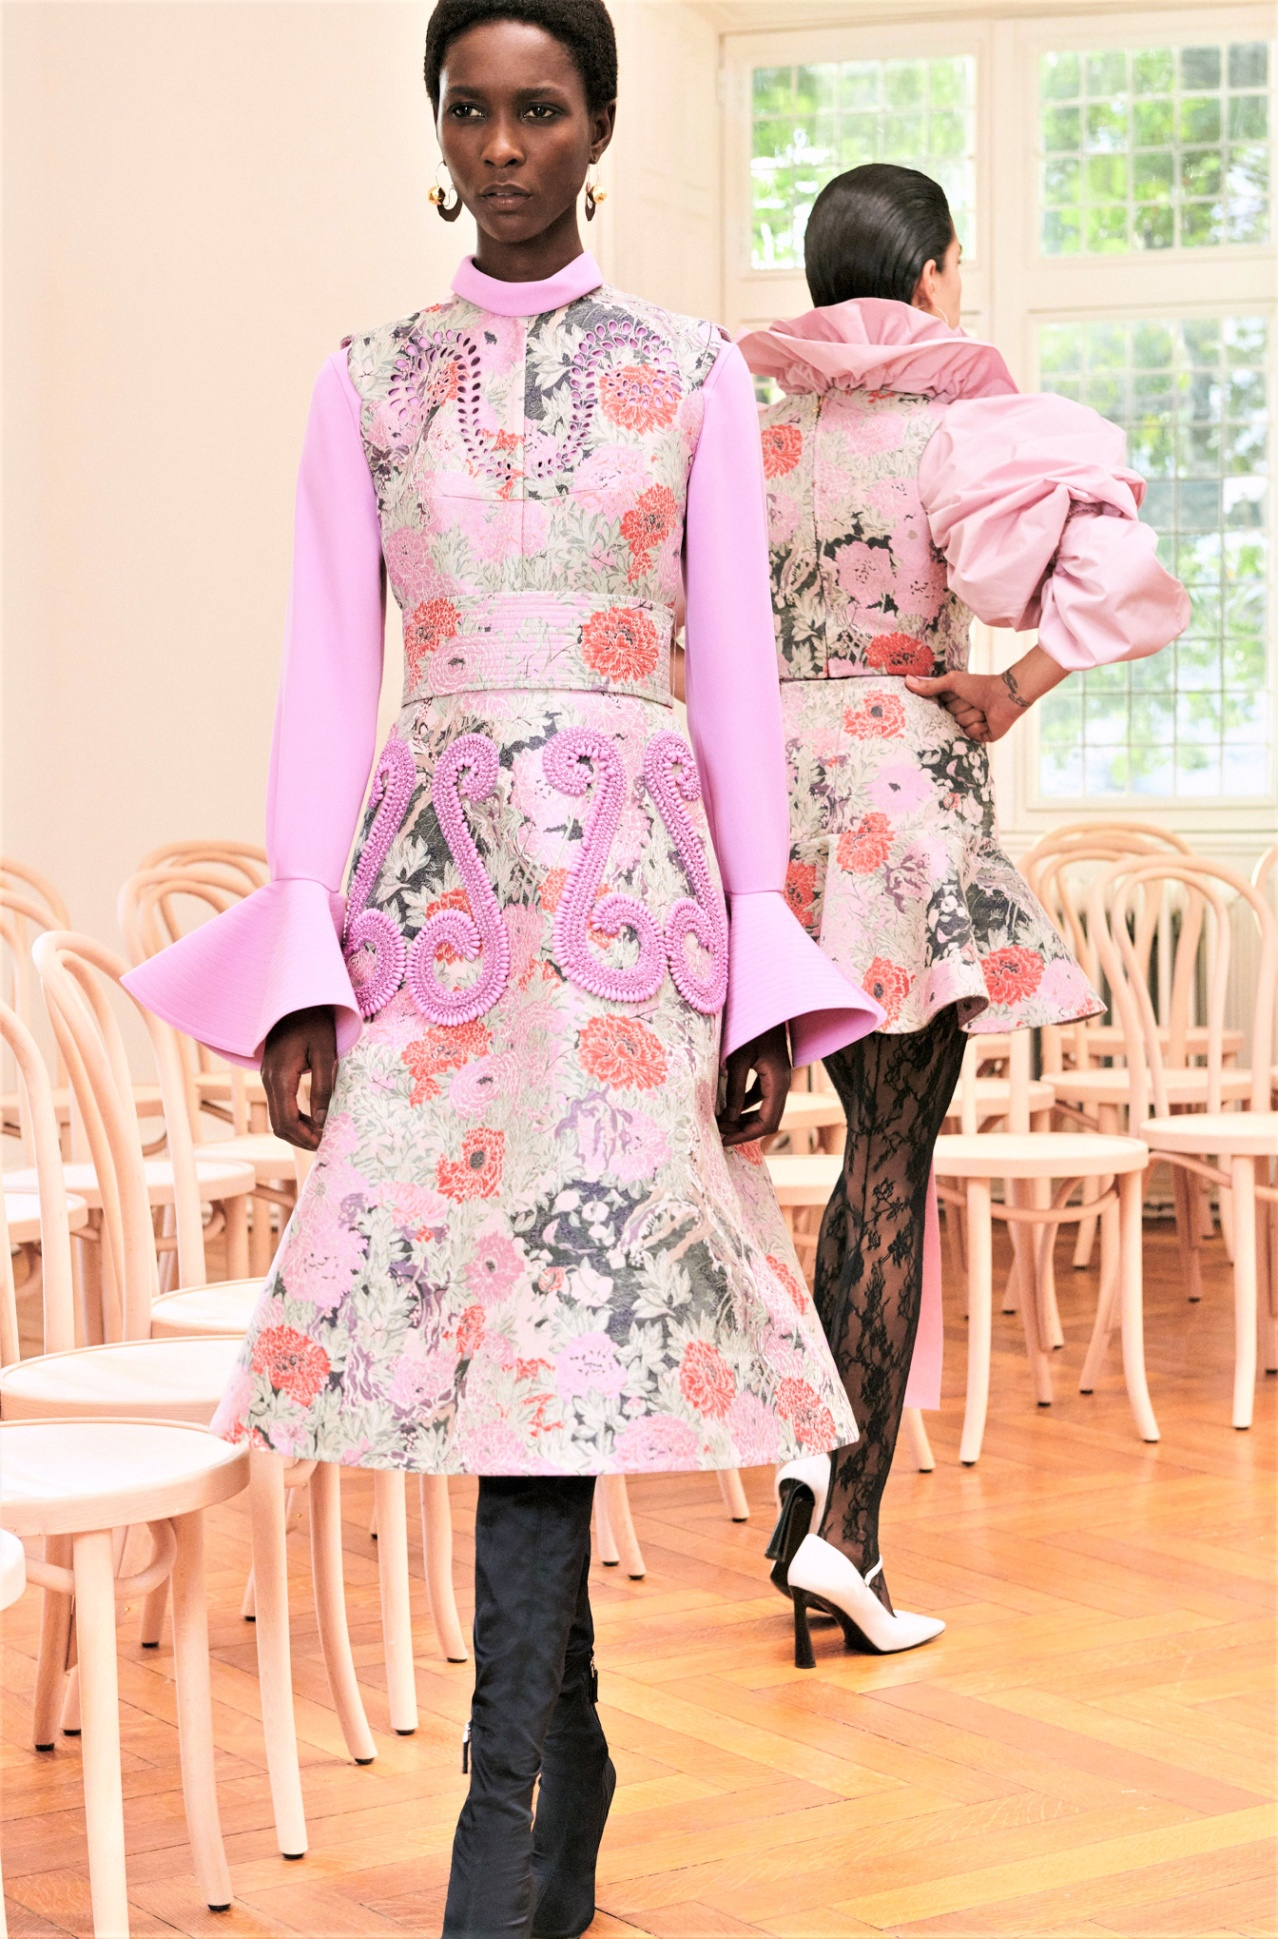 00014-Patou-RTW-Spring-2021-embroid pink dress Paris (2) cropped.jpg